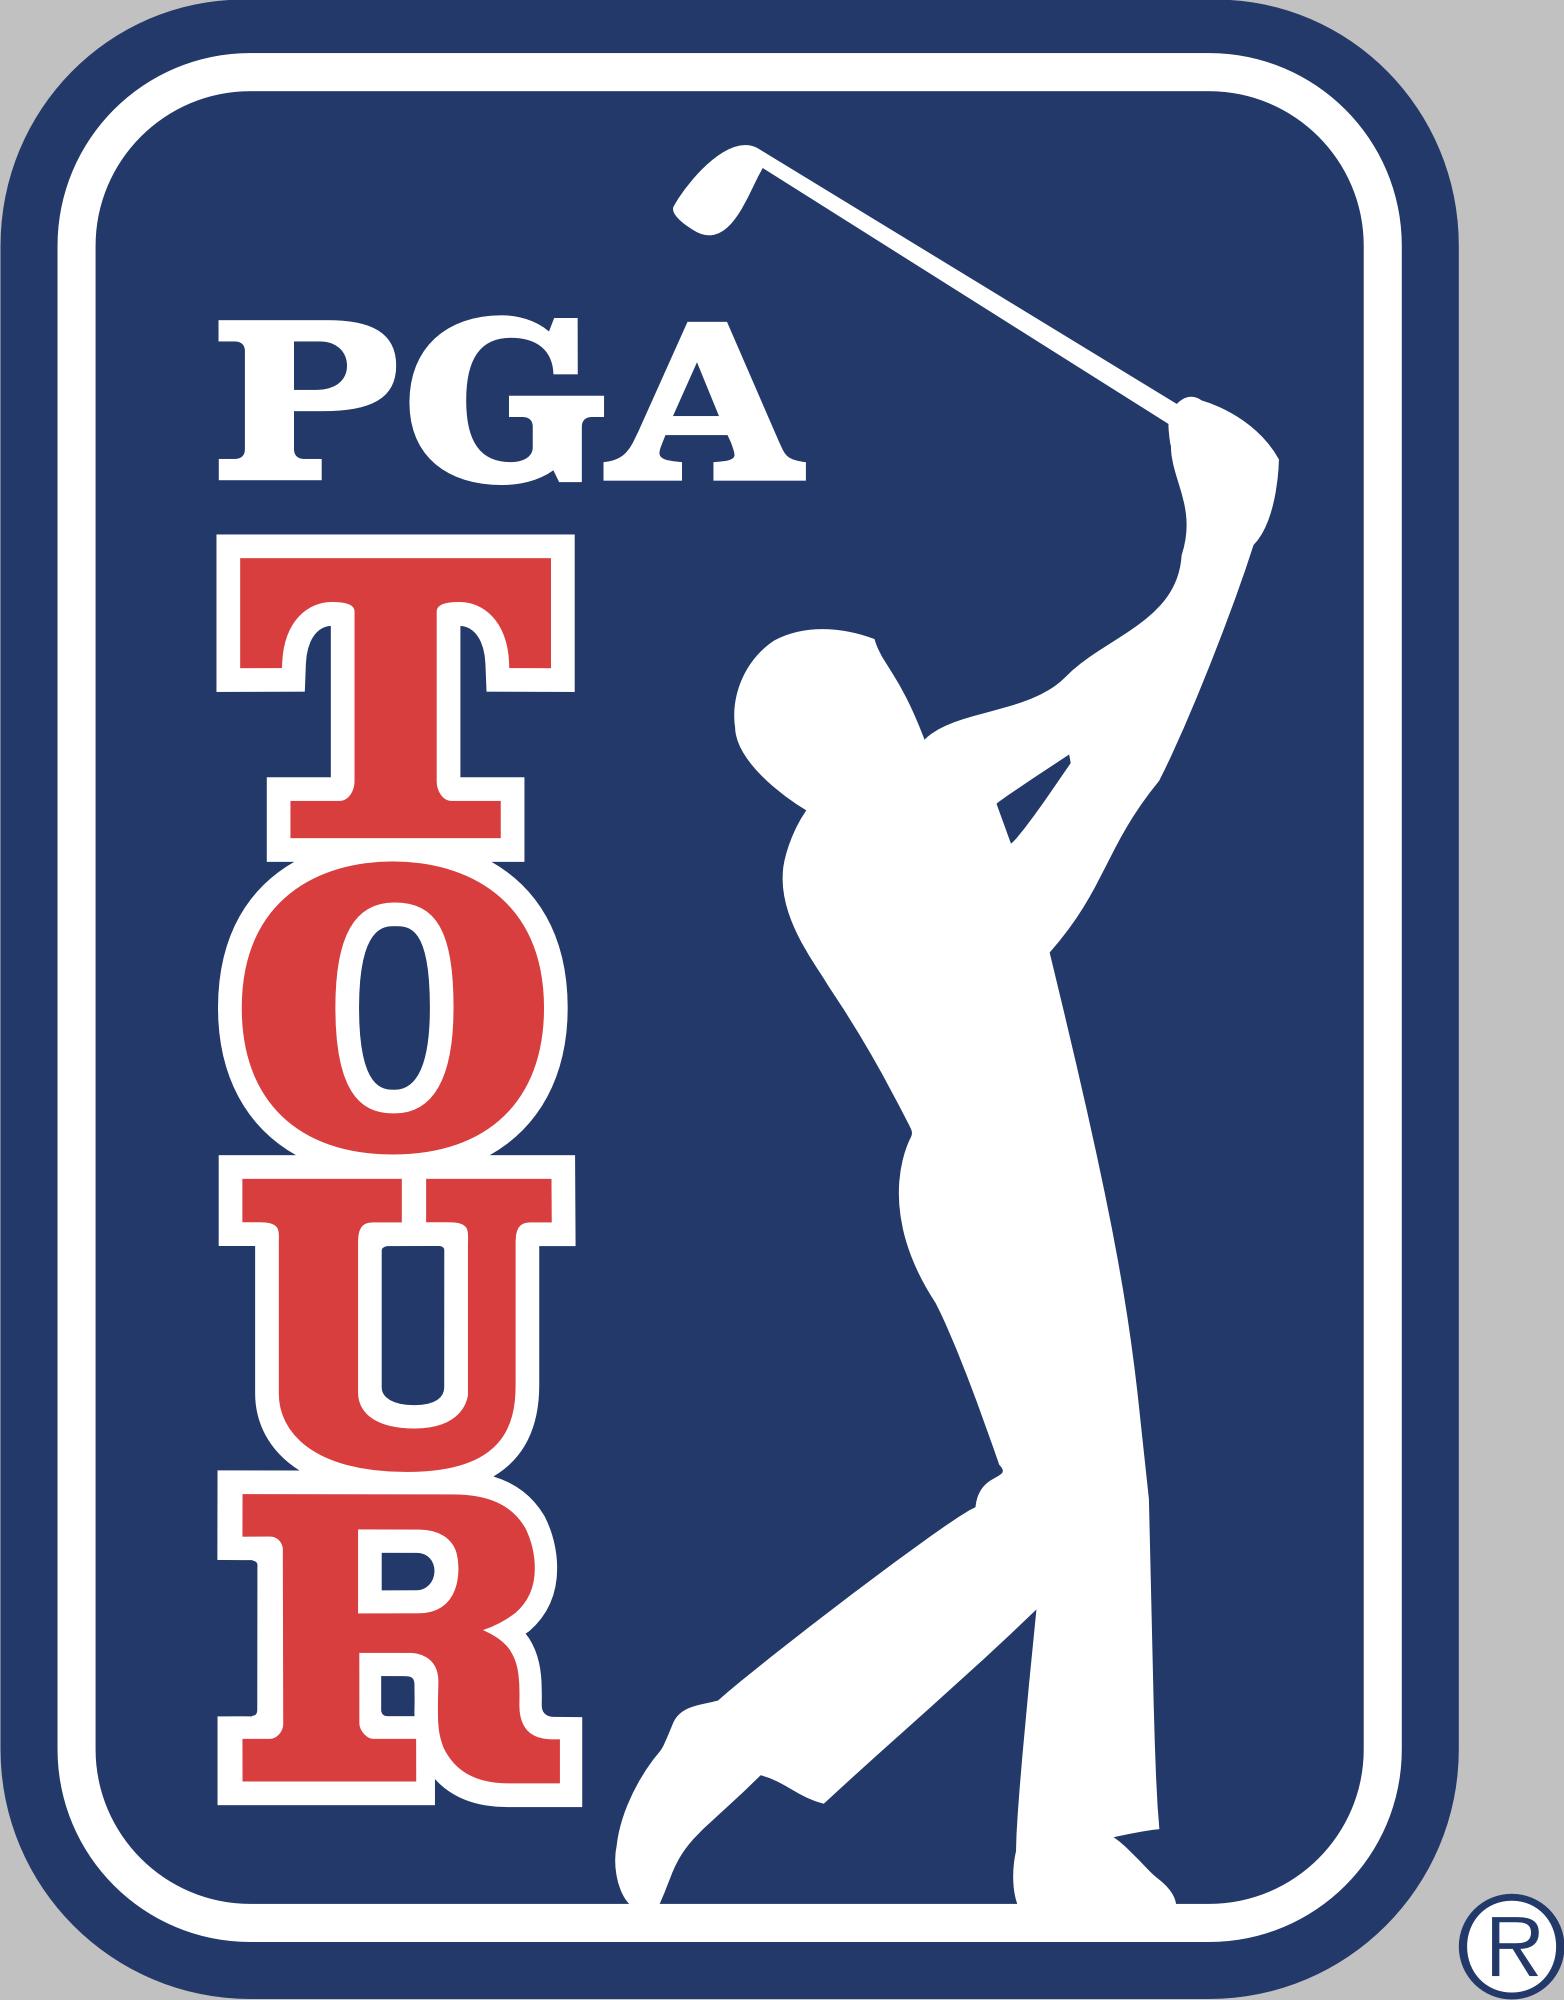 PGA PGA logo